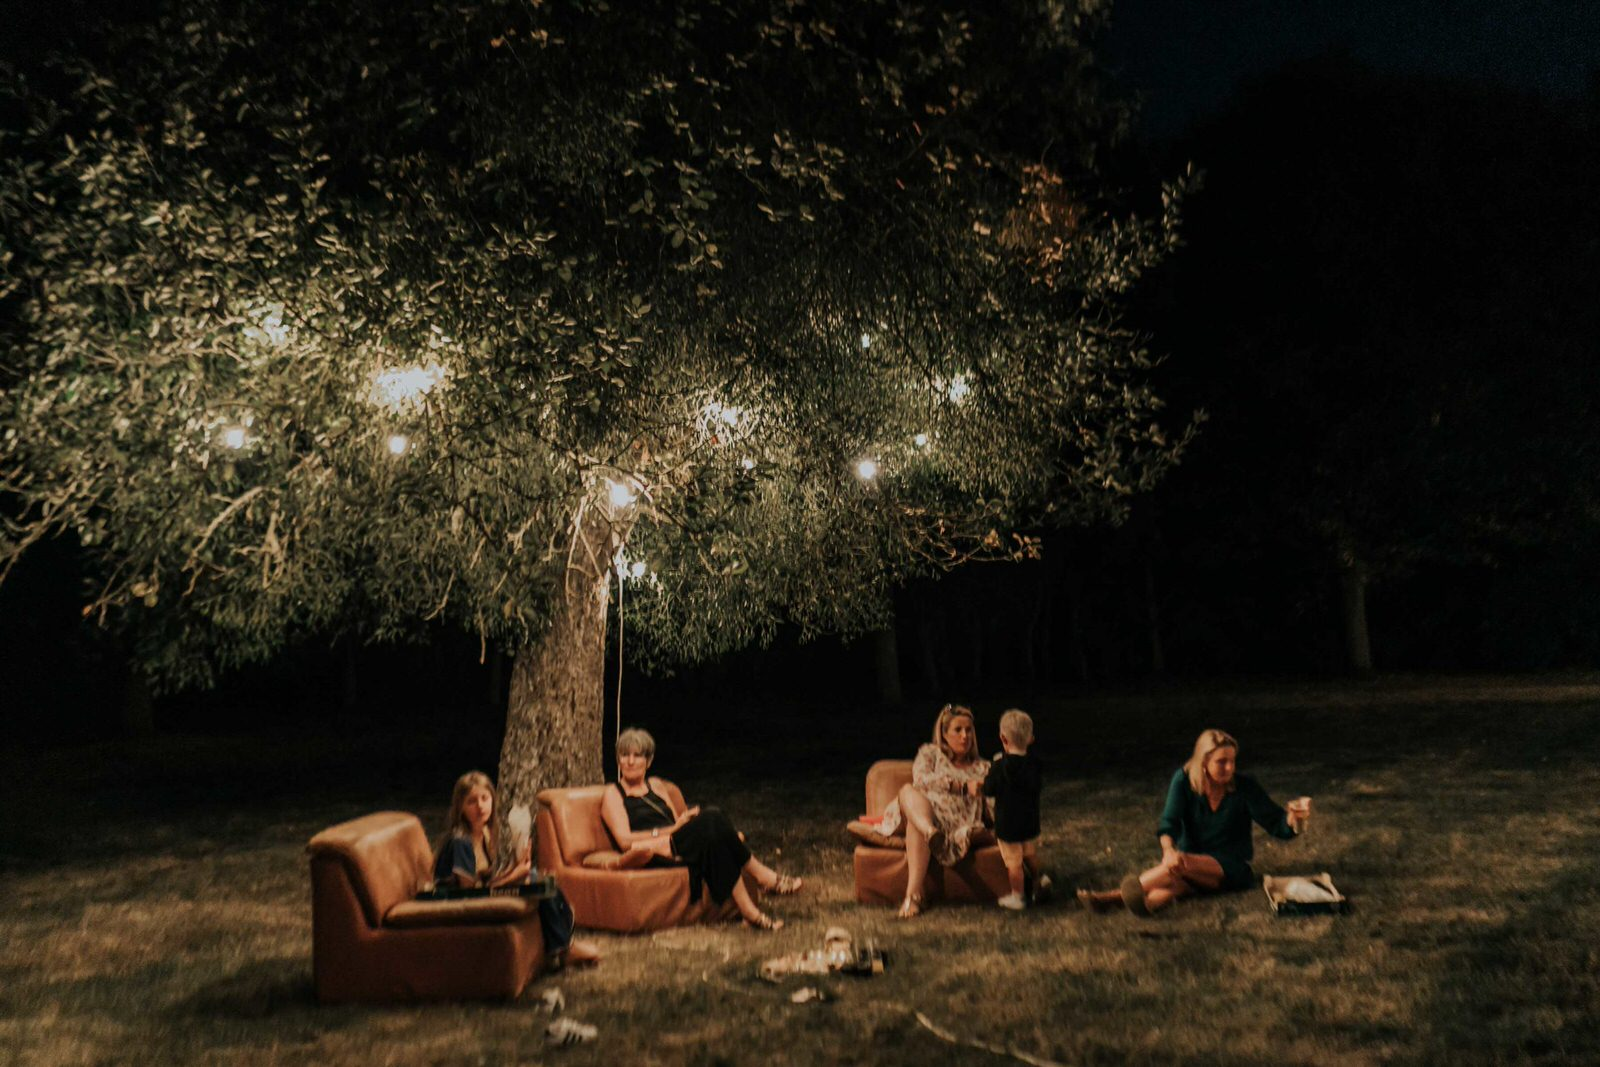 SFOREVER-MARIAGE-PHOTOGRAPHE-BELGIQUE-527-scaled-1